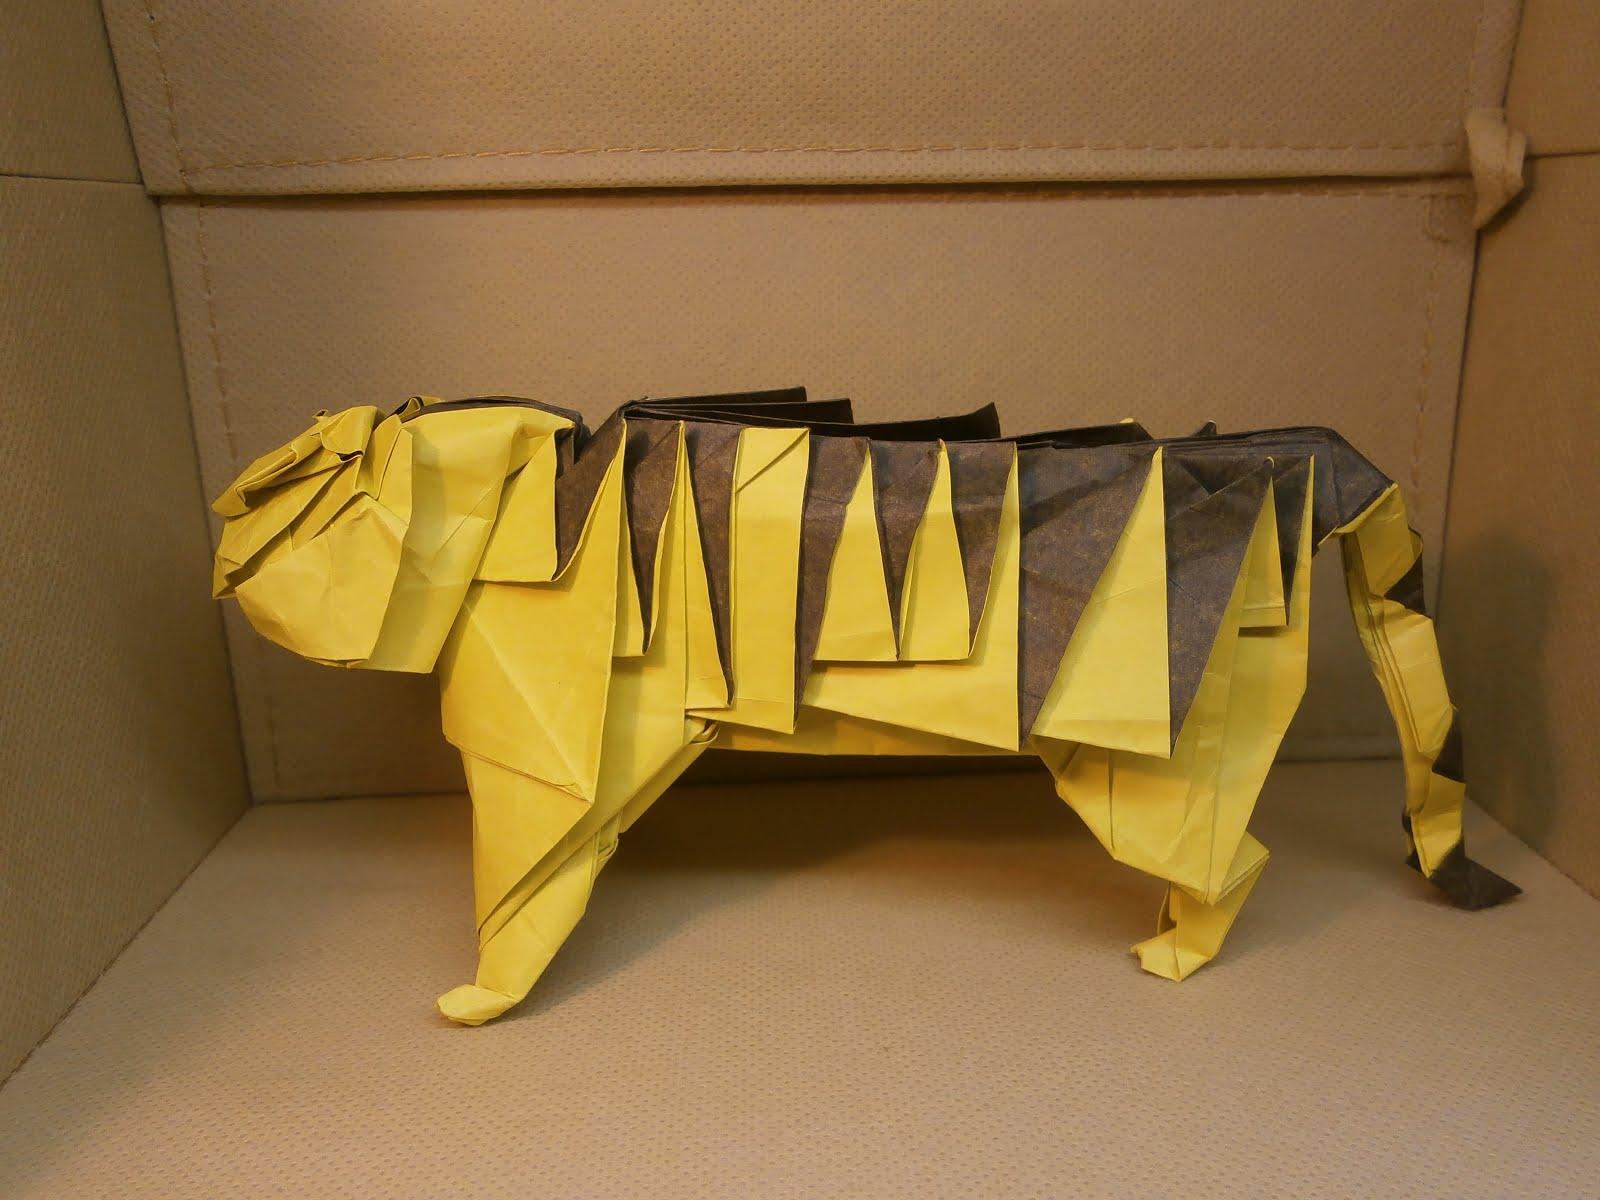 katakoto origami tiger from quotworks of hideo komatsuquot